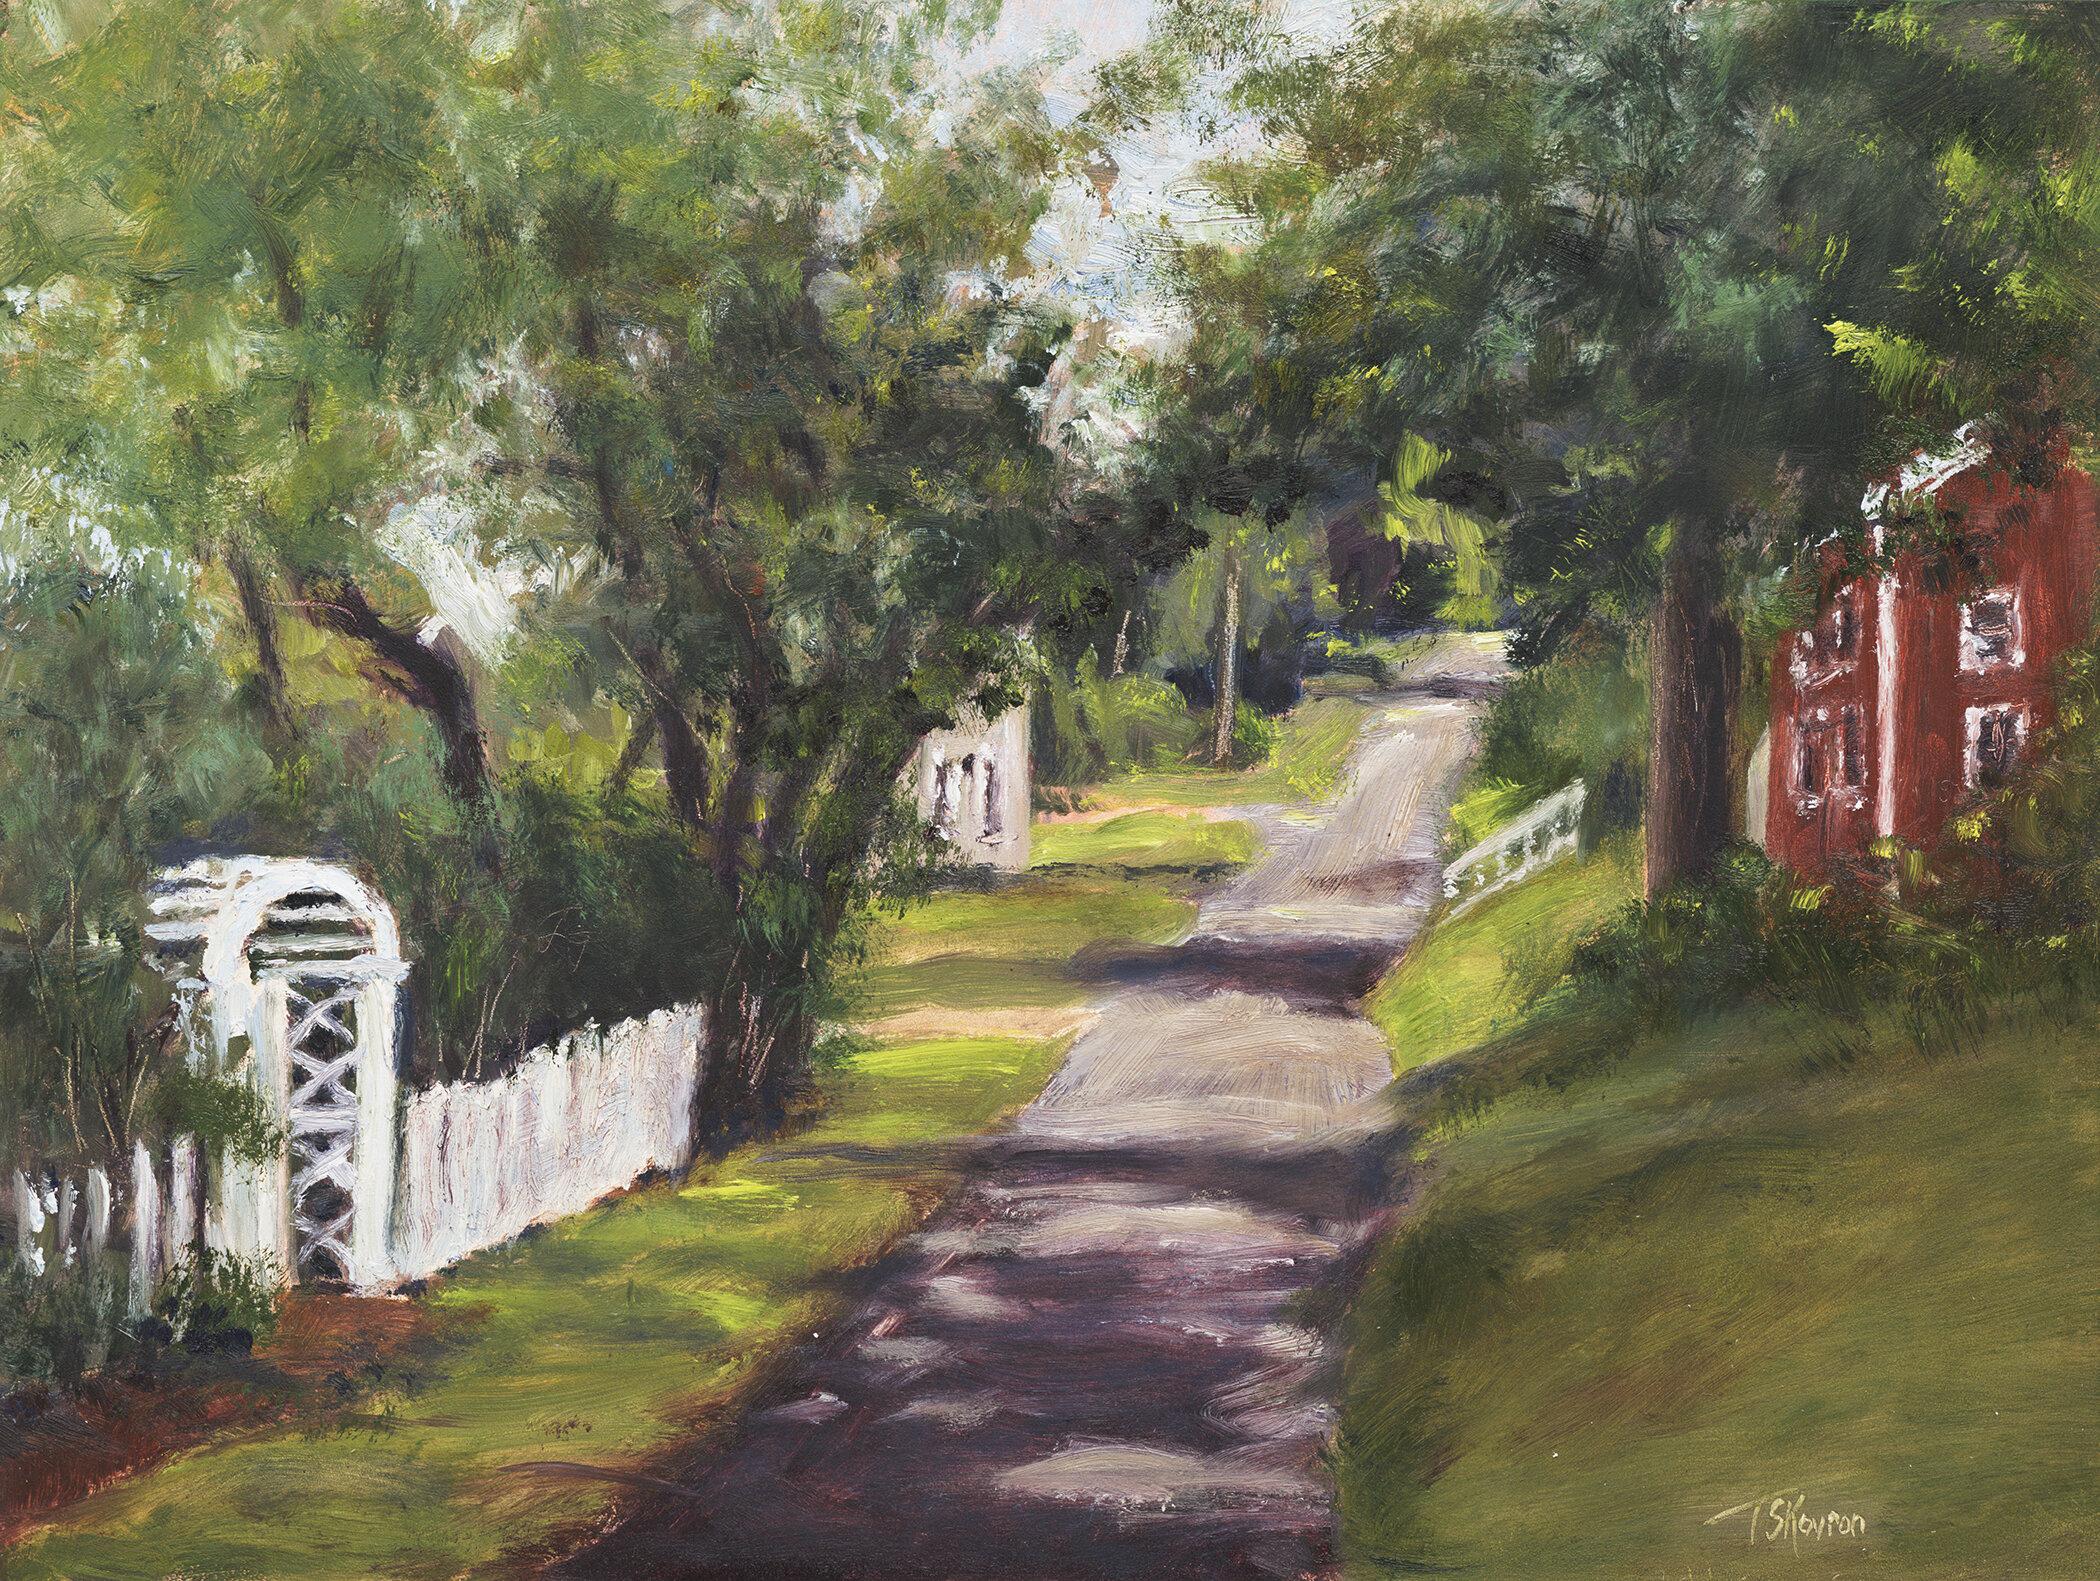 """Wharf Lane"" Rocks Village, Haverhill, MA - 12"" x 9"" oil on panel in 3.5""W gold leaf frame"